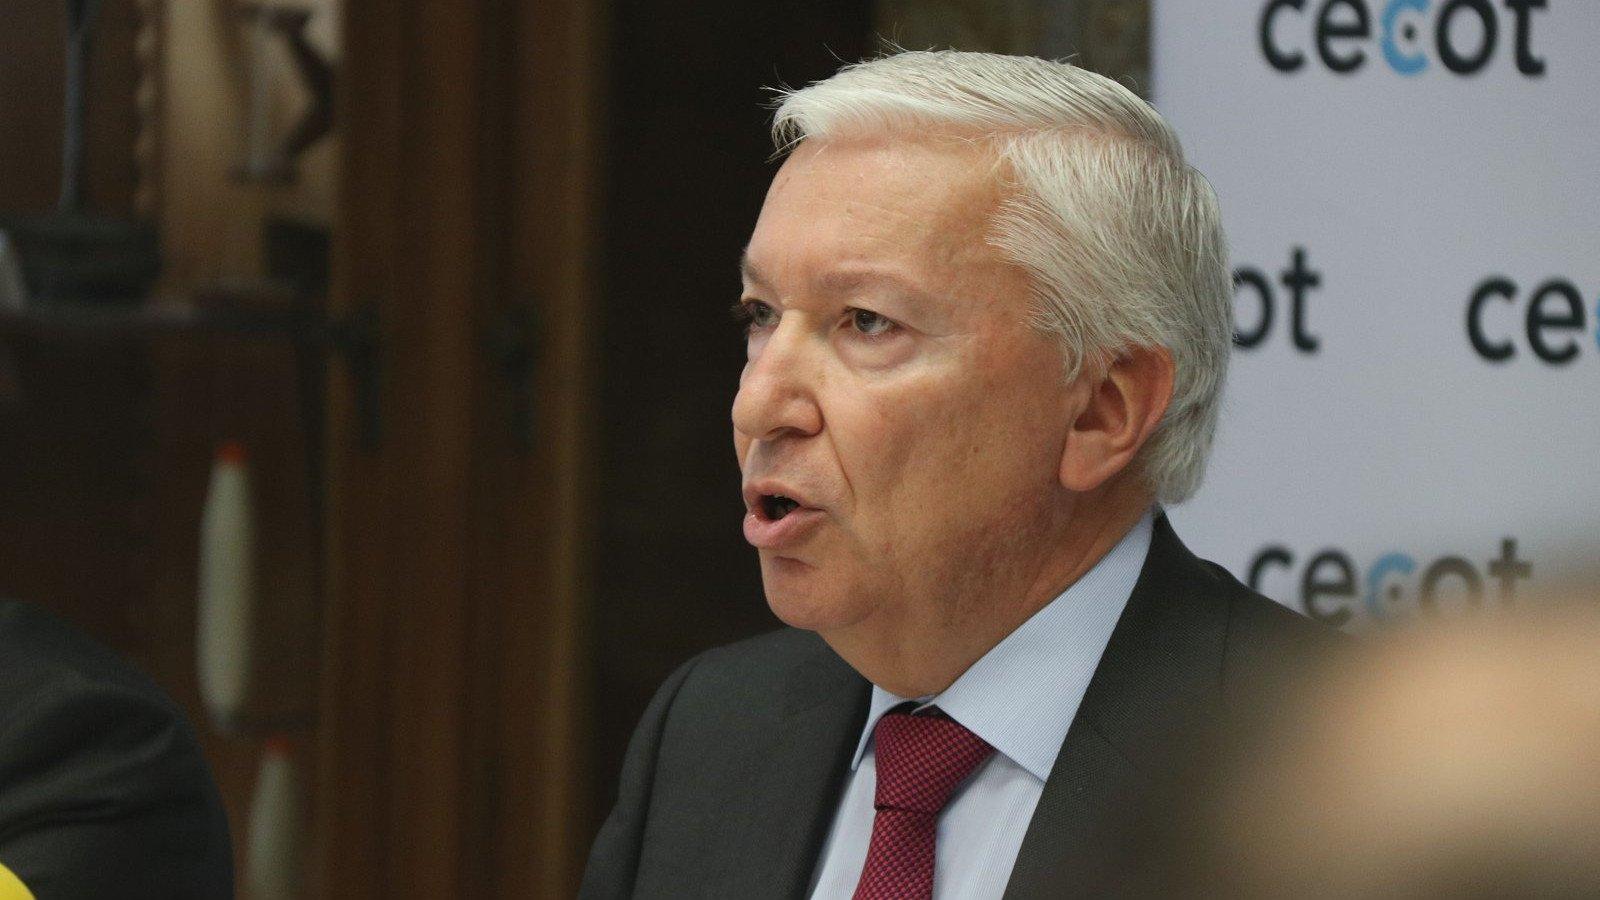 Antoni Abad, president de Cecot